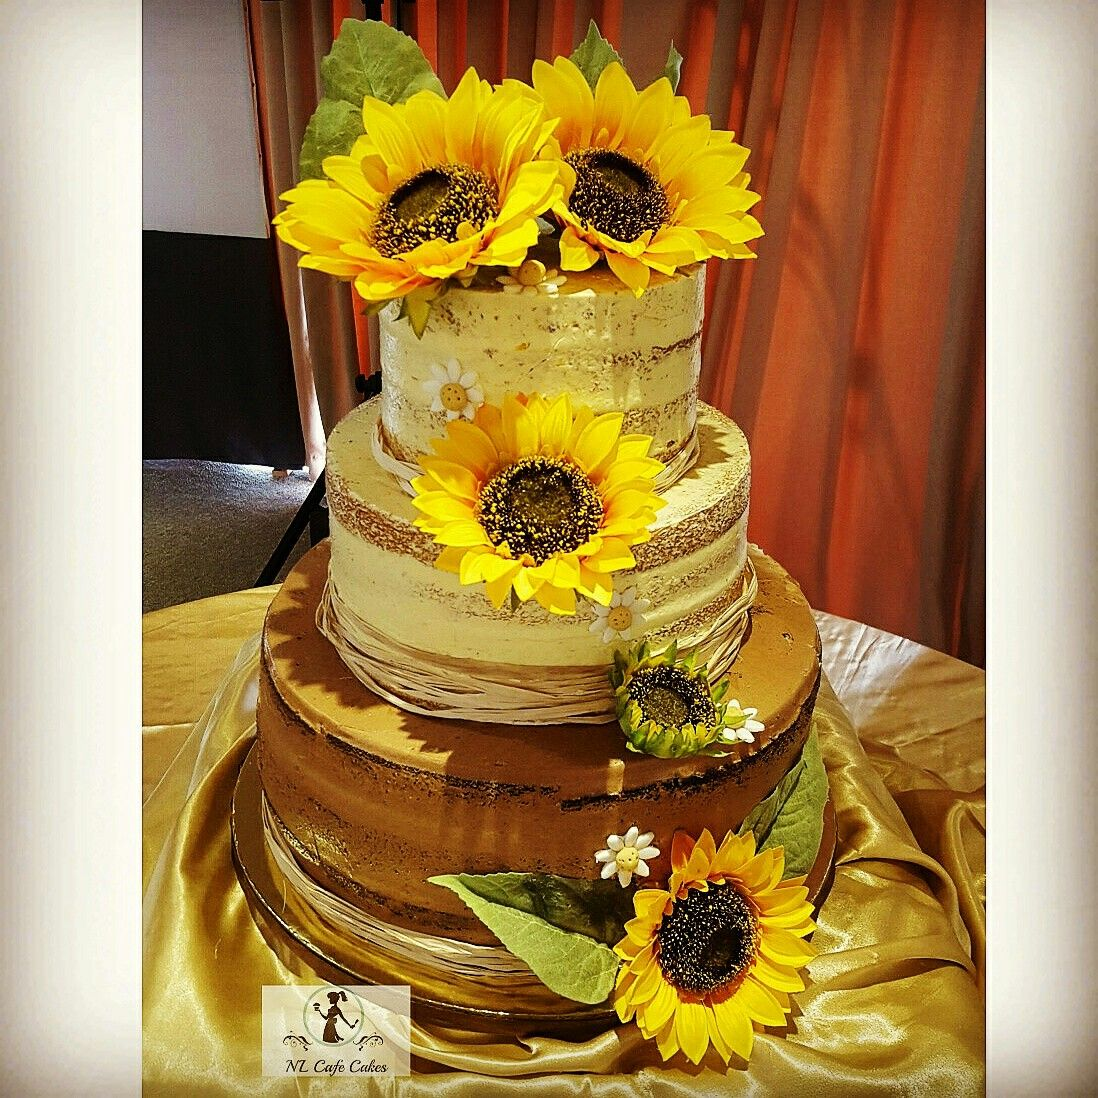 Sunflower Rustic Semi Naked Wedding Cake | My Decorations ...